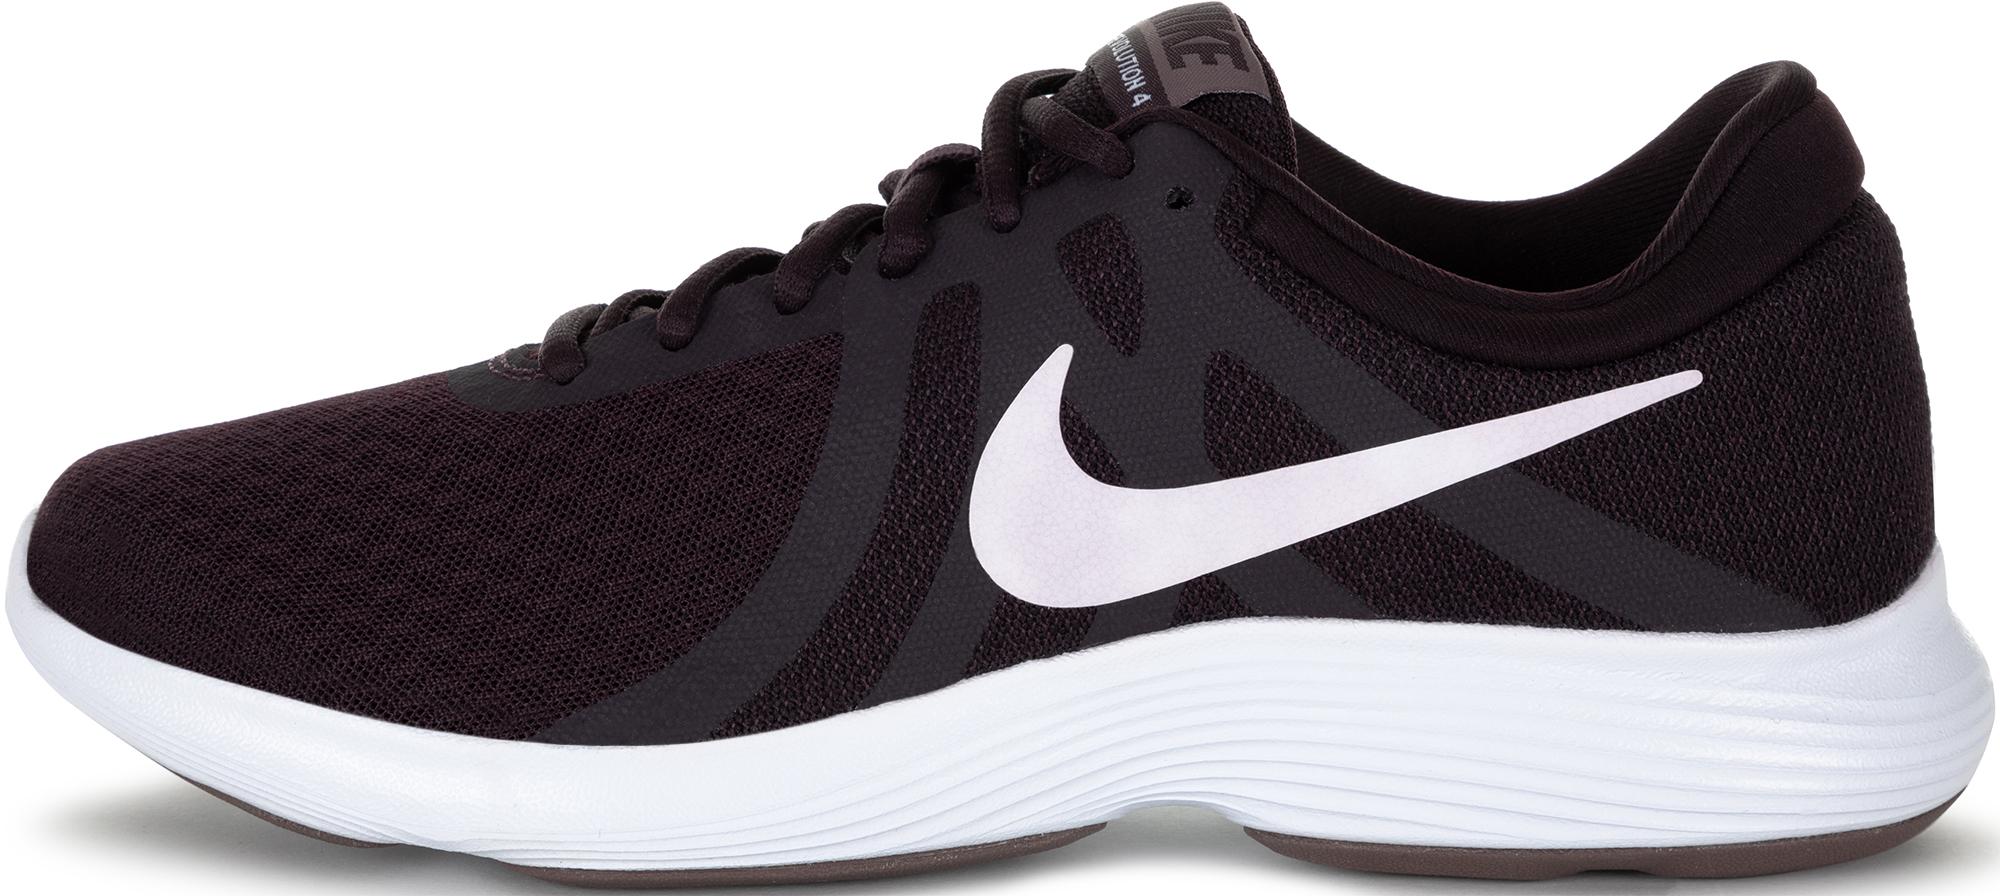 Nike Кроссовки женские Nike Revolution 4, размер 40